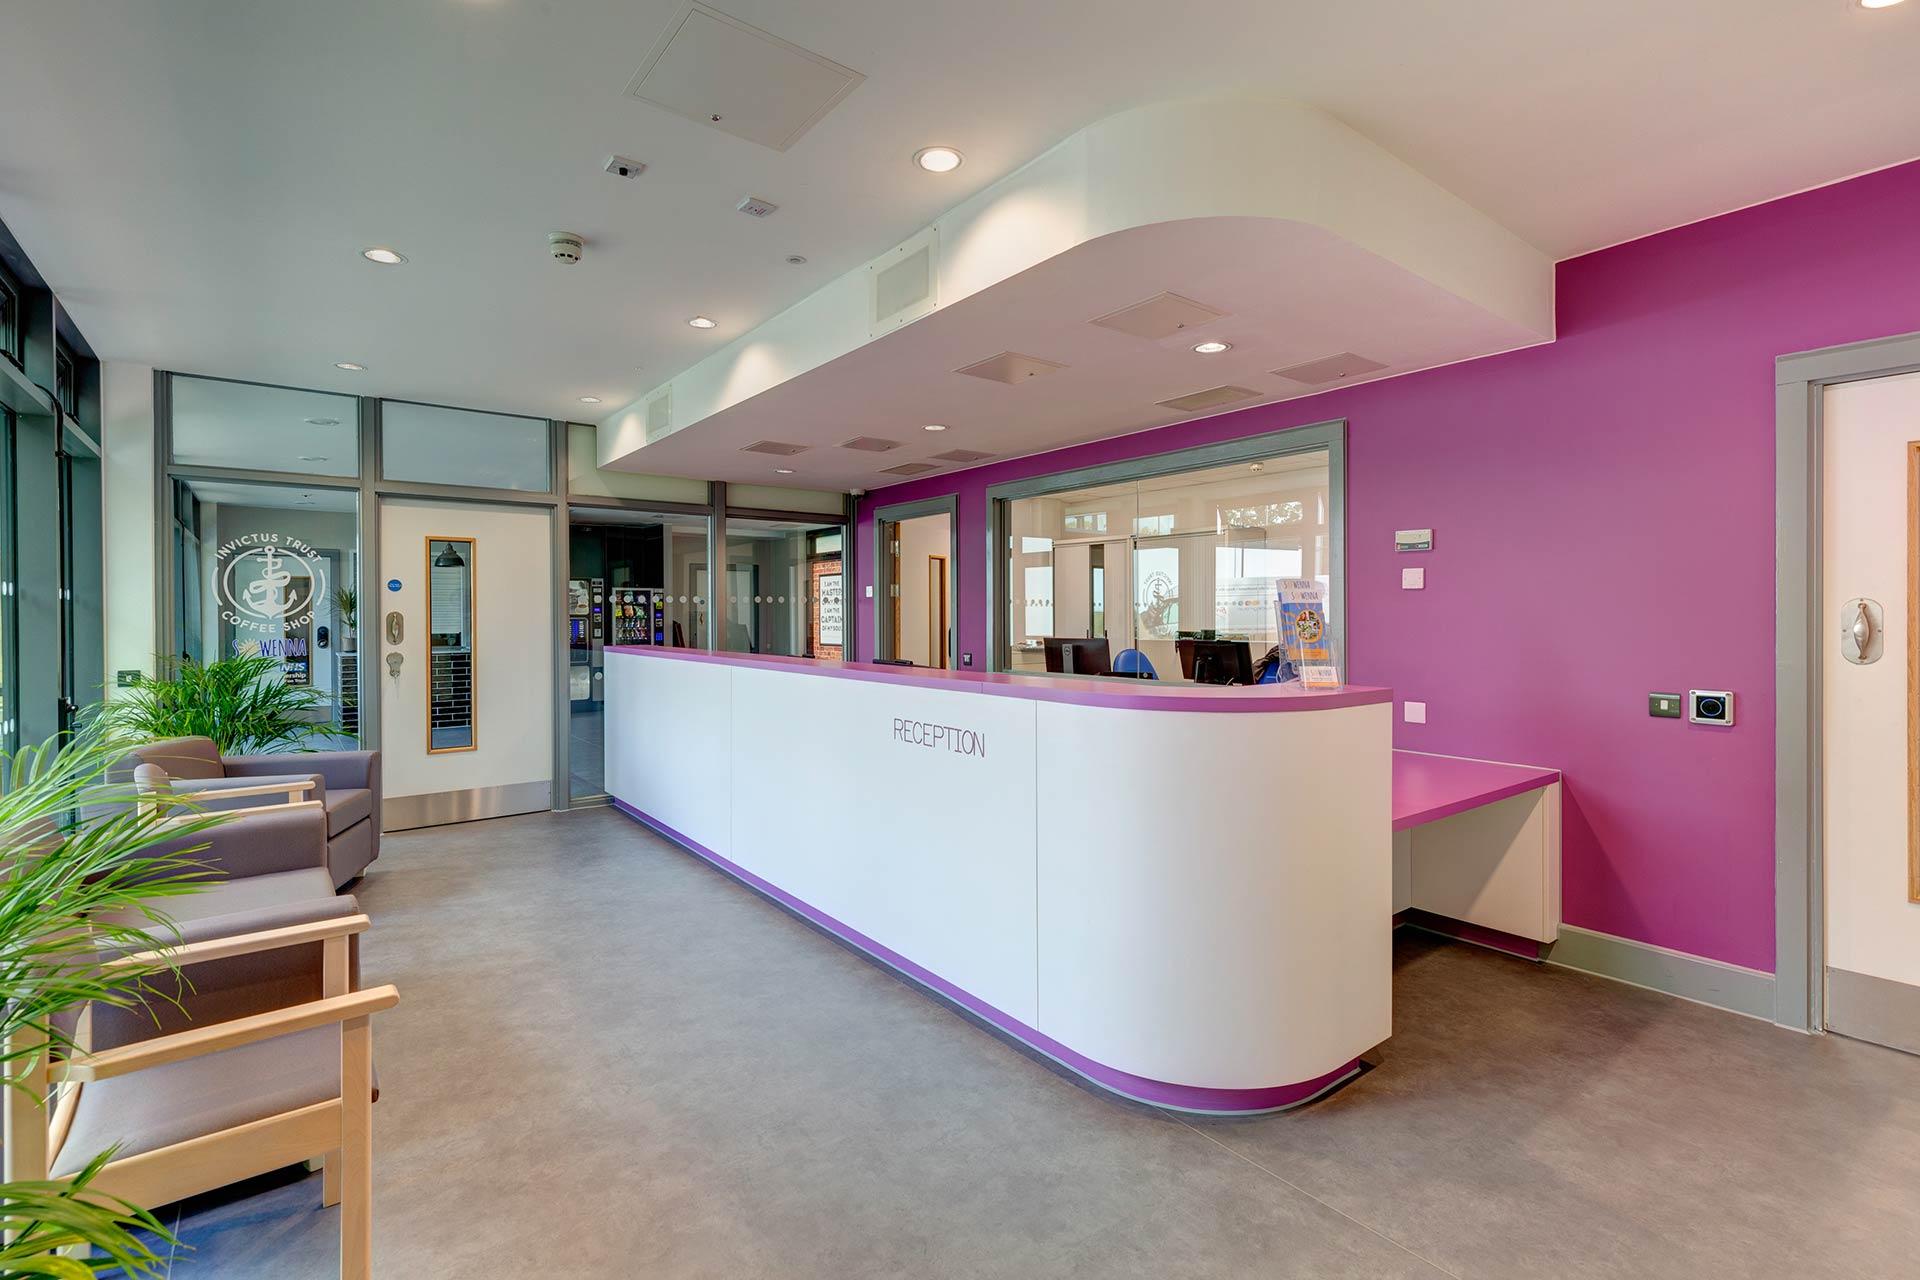 Sowenna CAMHS Reception Area and Coffee Shop